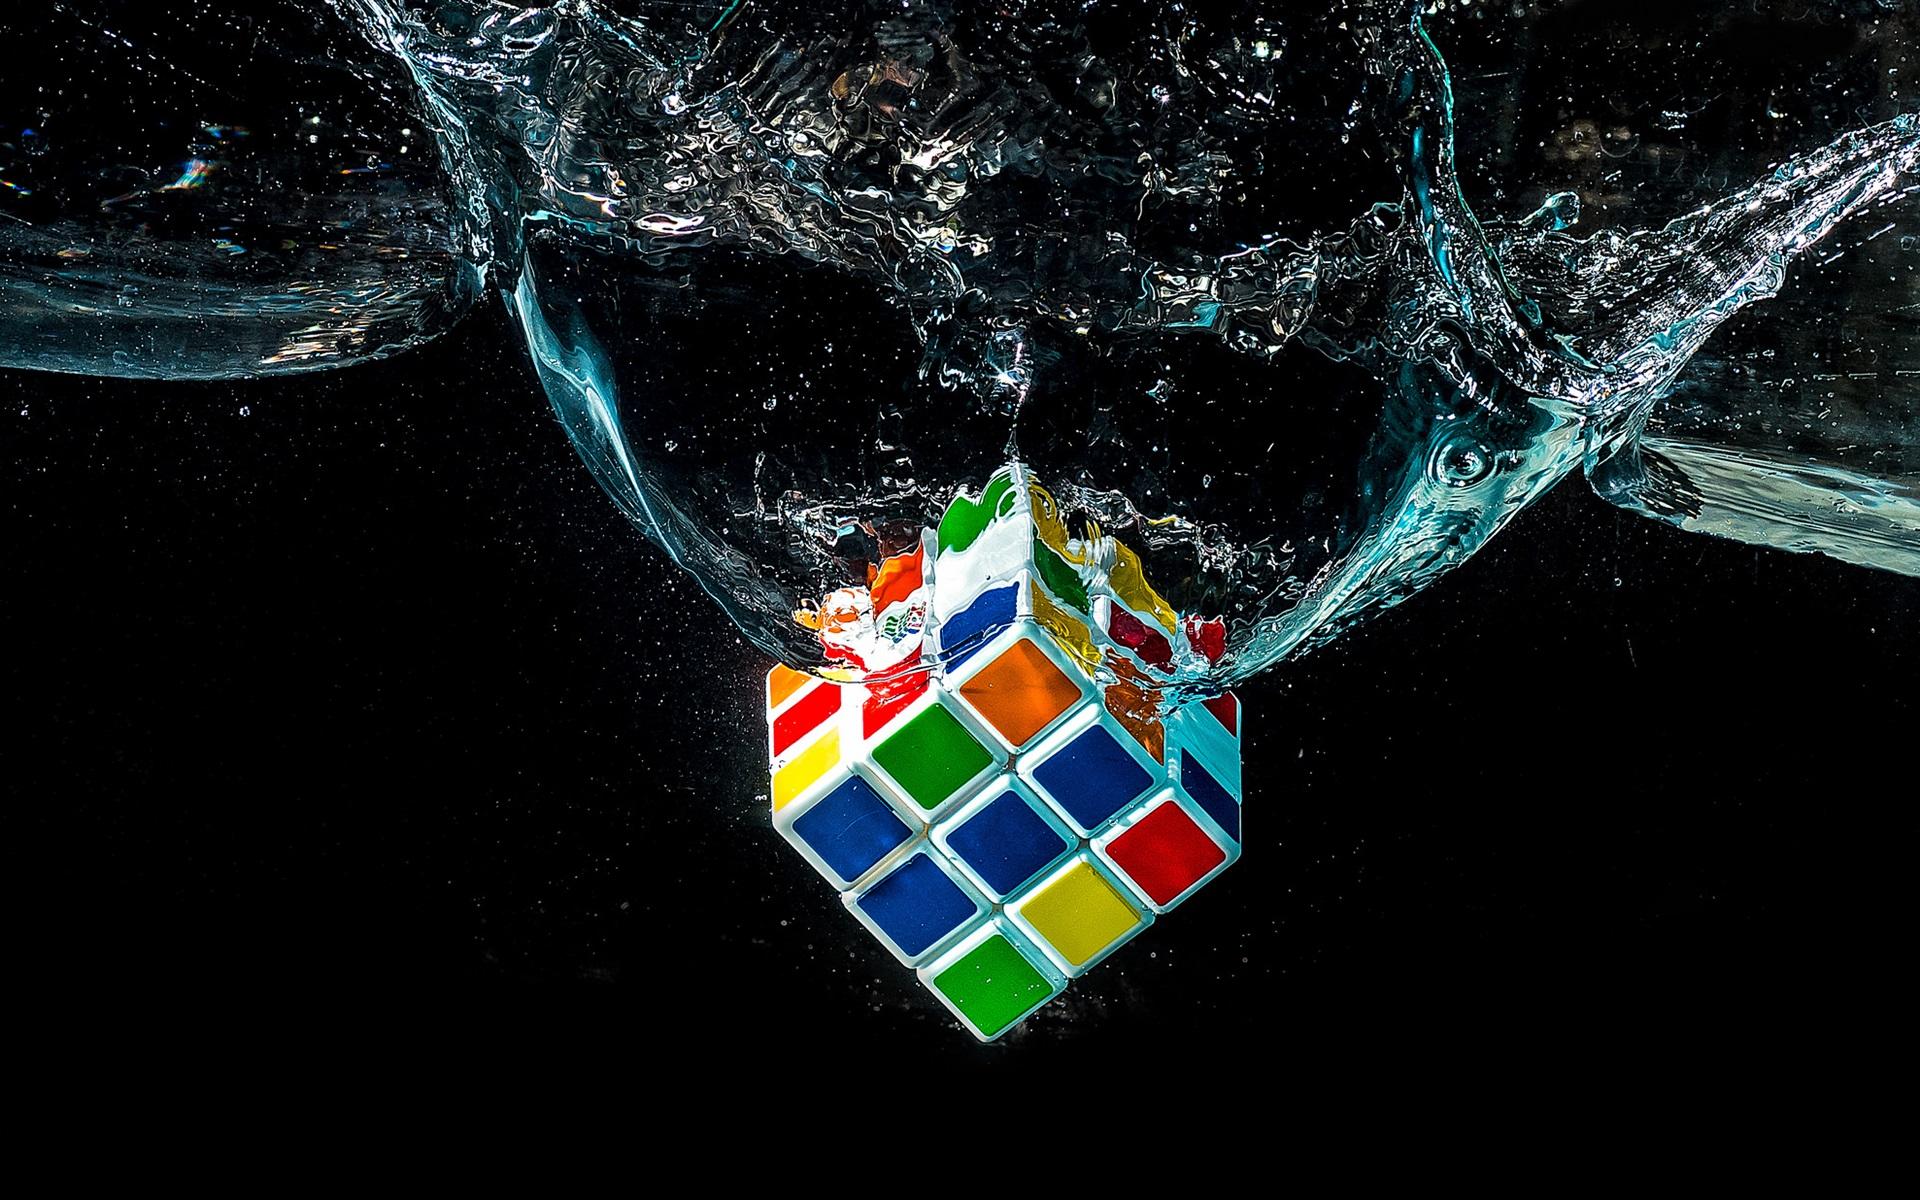 wallpaper rubik's cube falling in water 1920x1200 hd picture, image